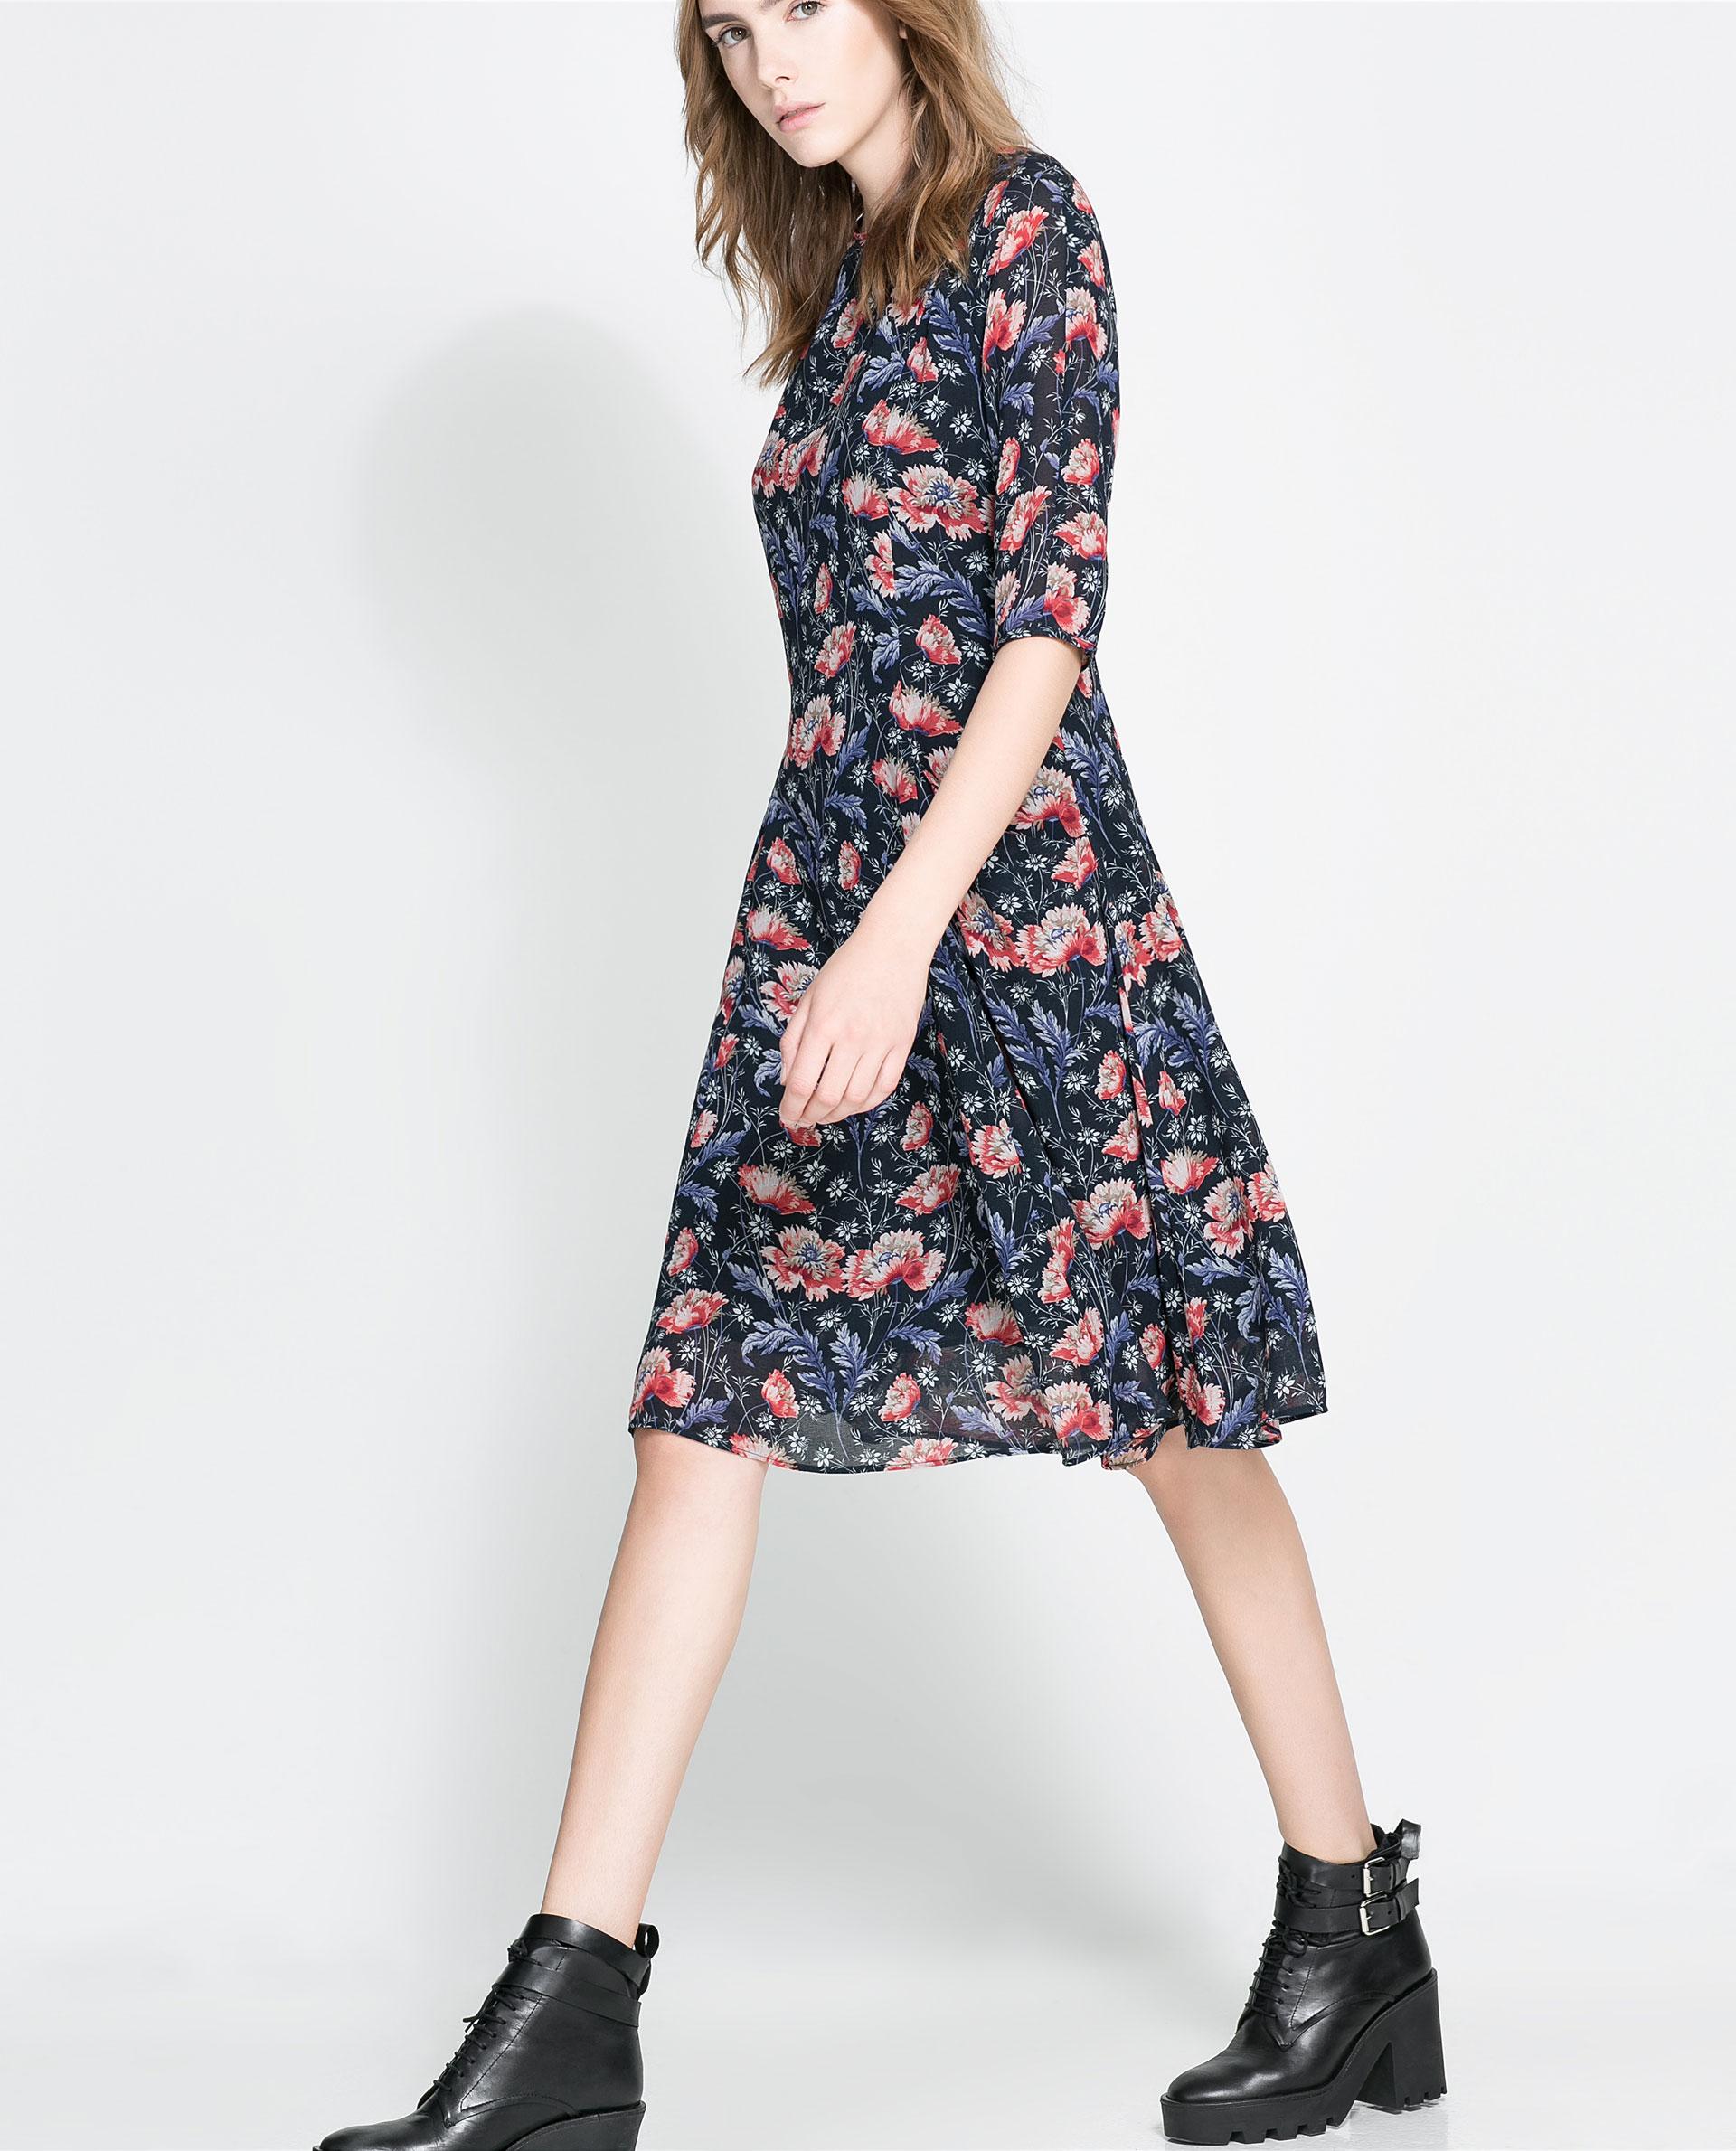 Zara kleid 2018